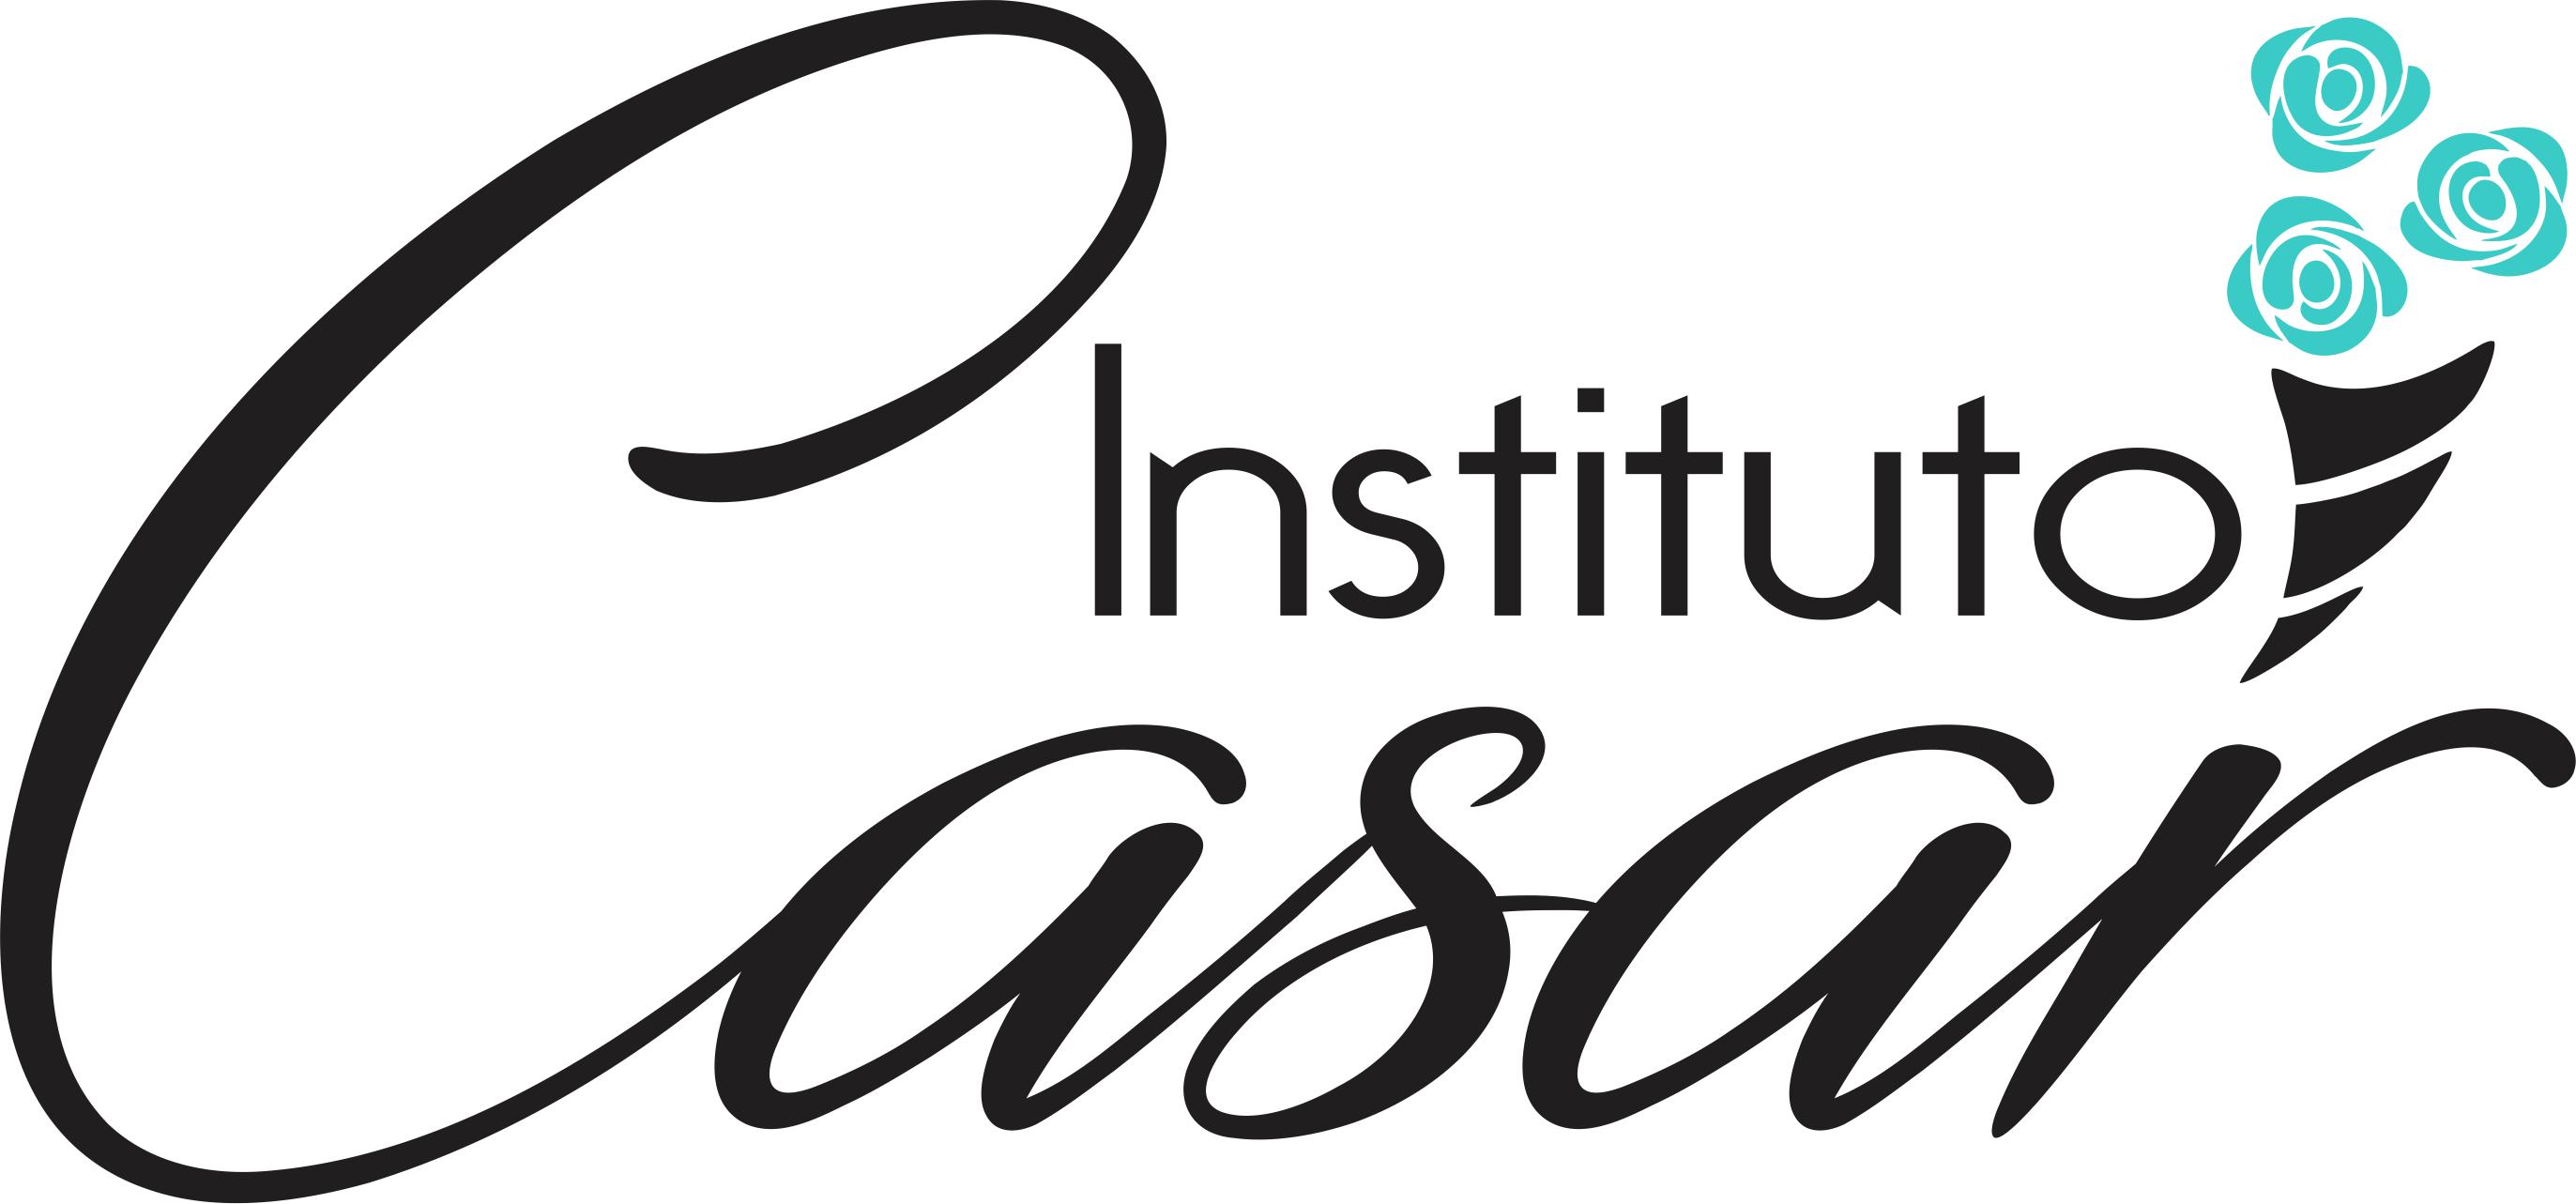 Instituto Casar Brazil